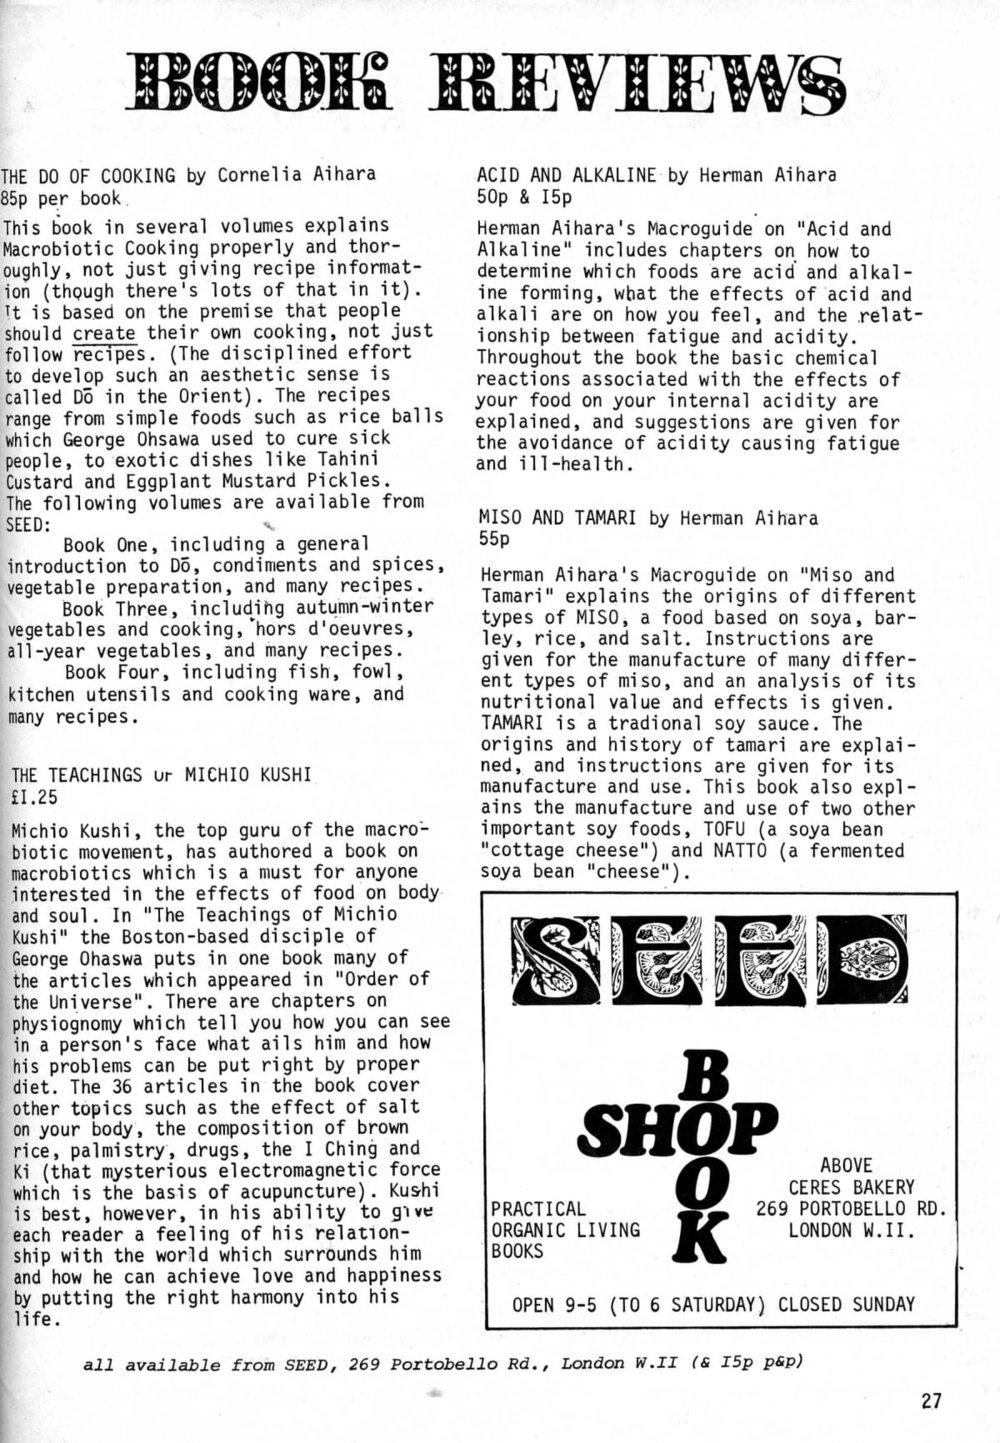 seed-v2-n6-june1973-27.jpg